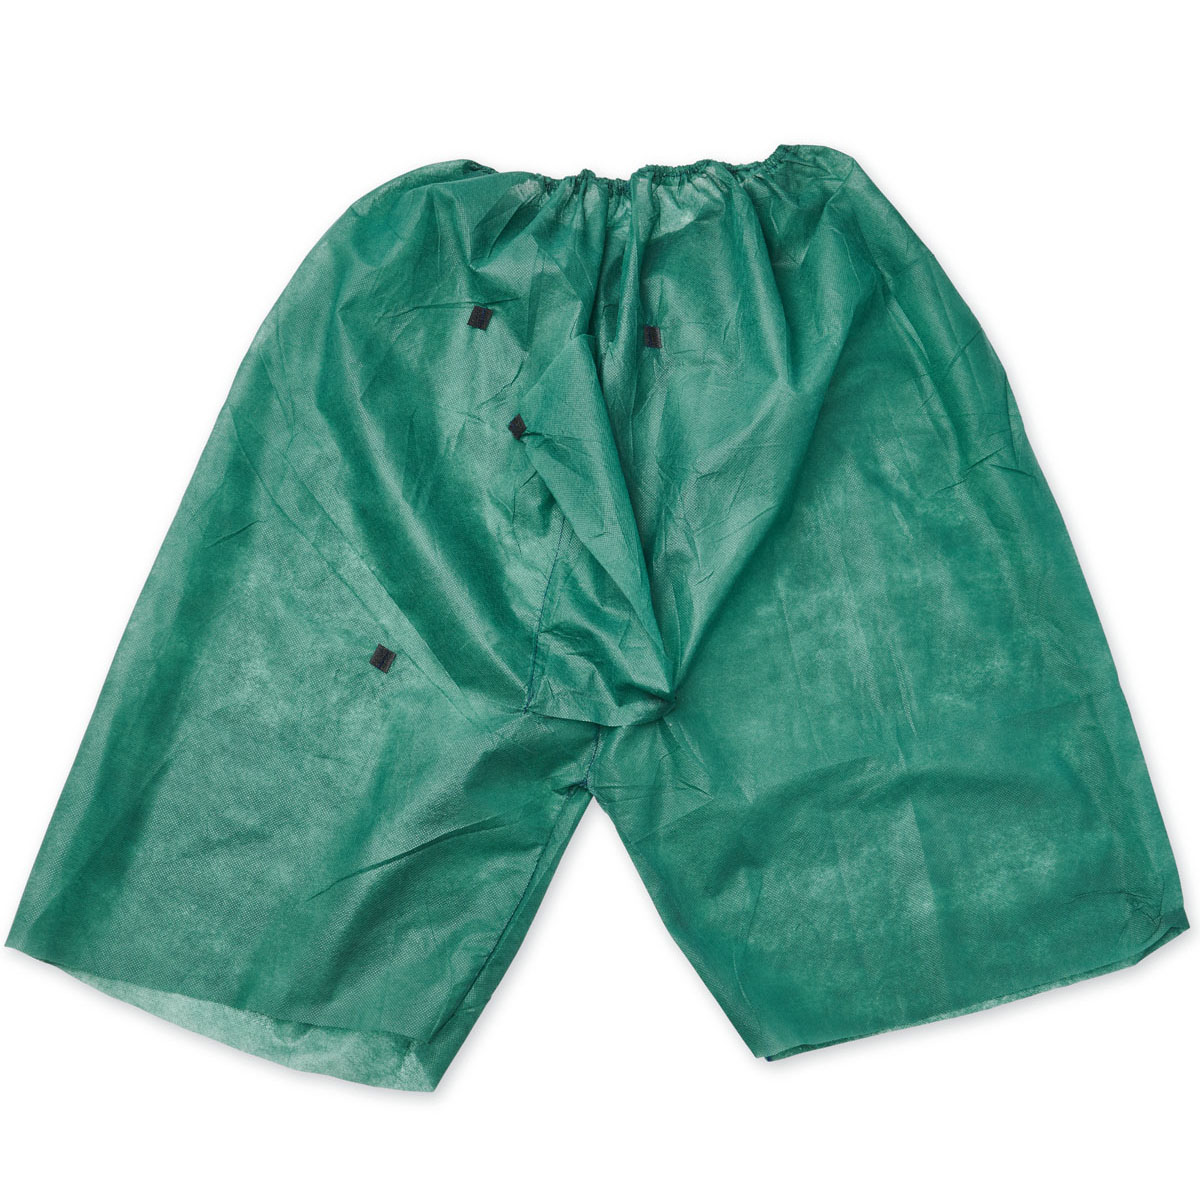 Colonoscopy Shorts Image